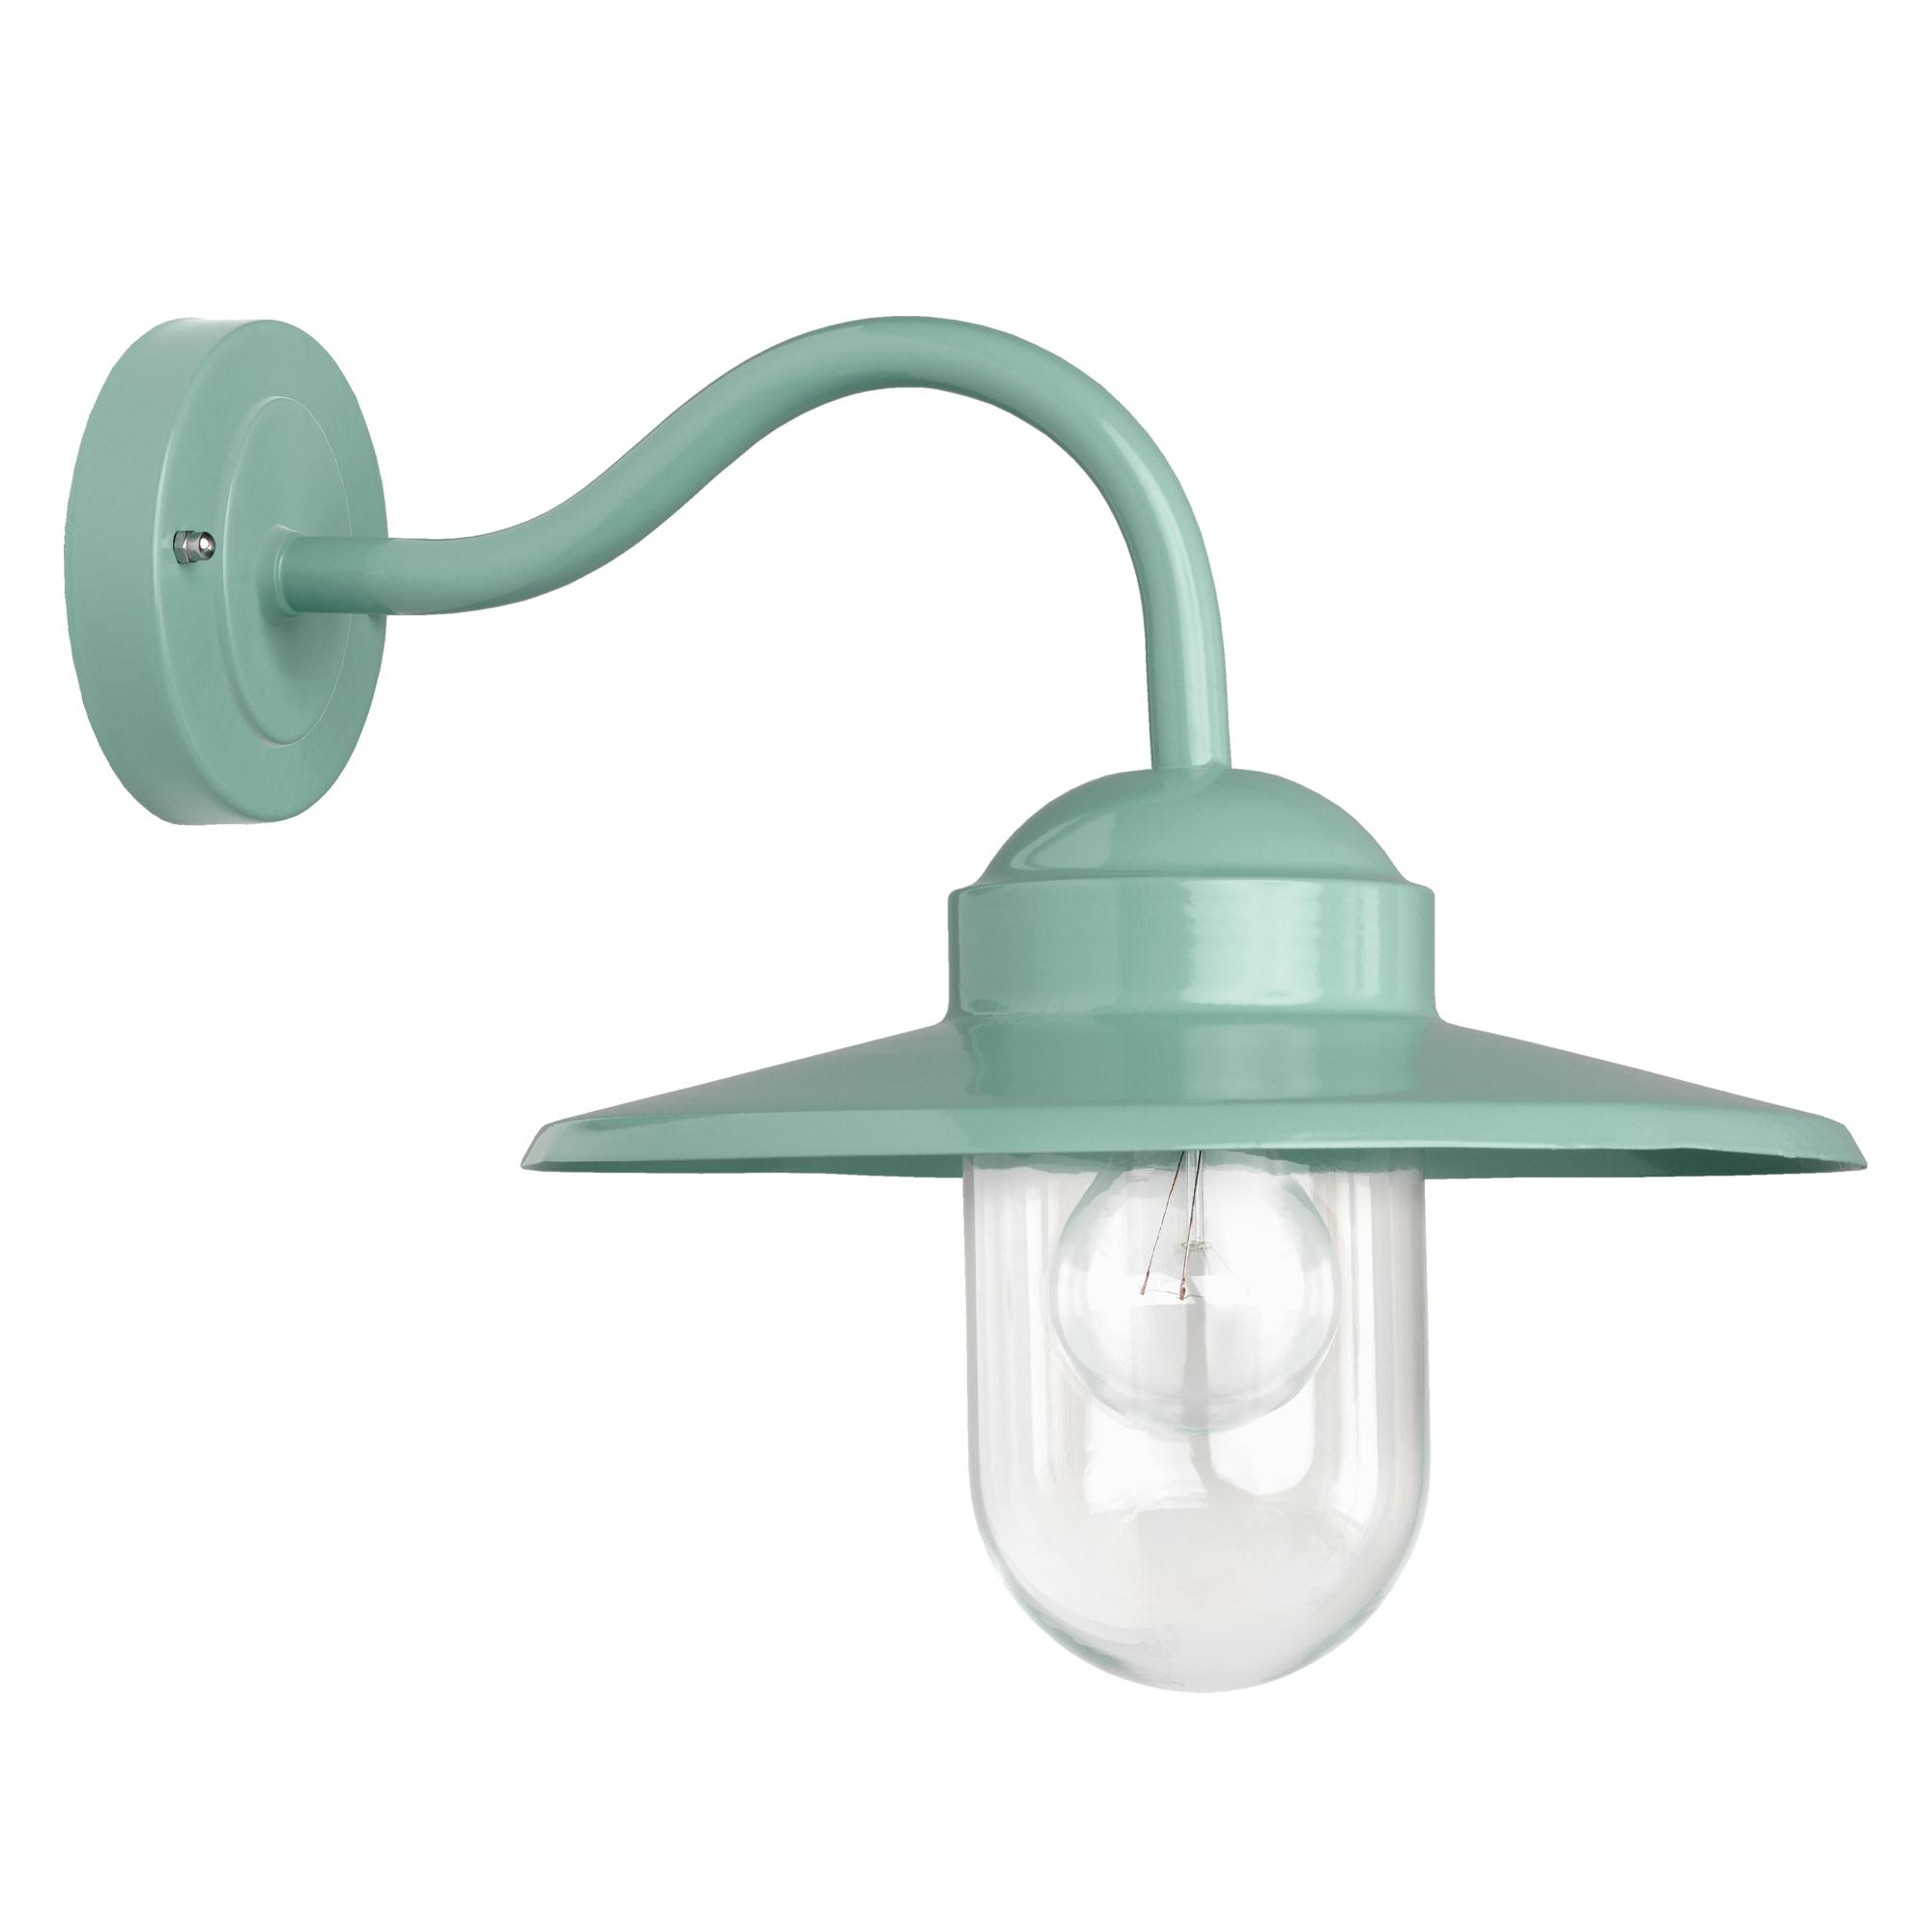 Buitenlamp Dolce Retro Groen Dag Nacht Schemersensor LED